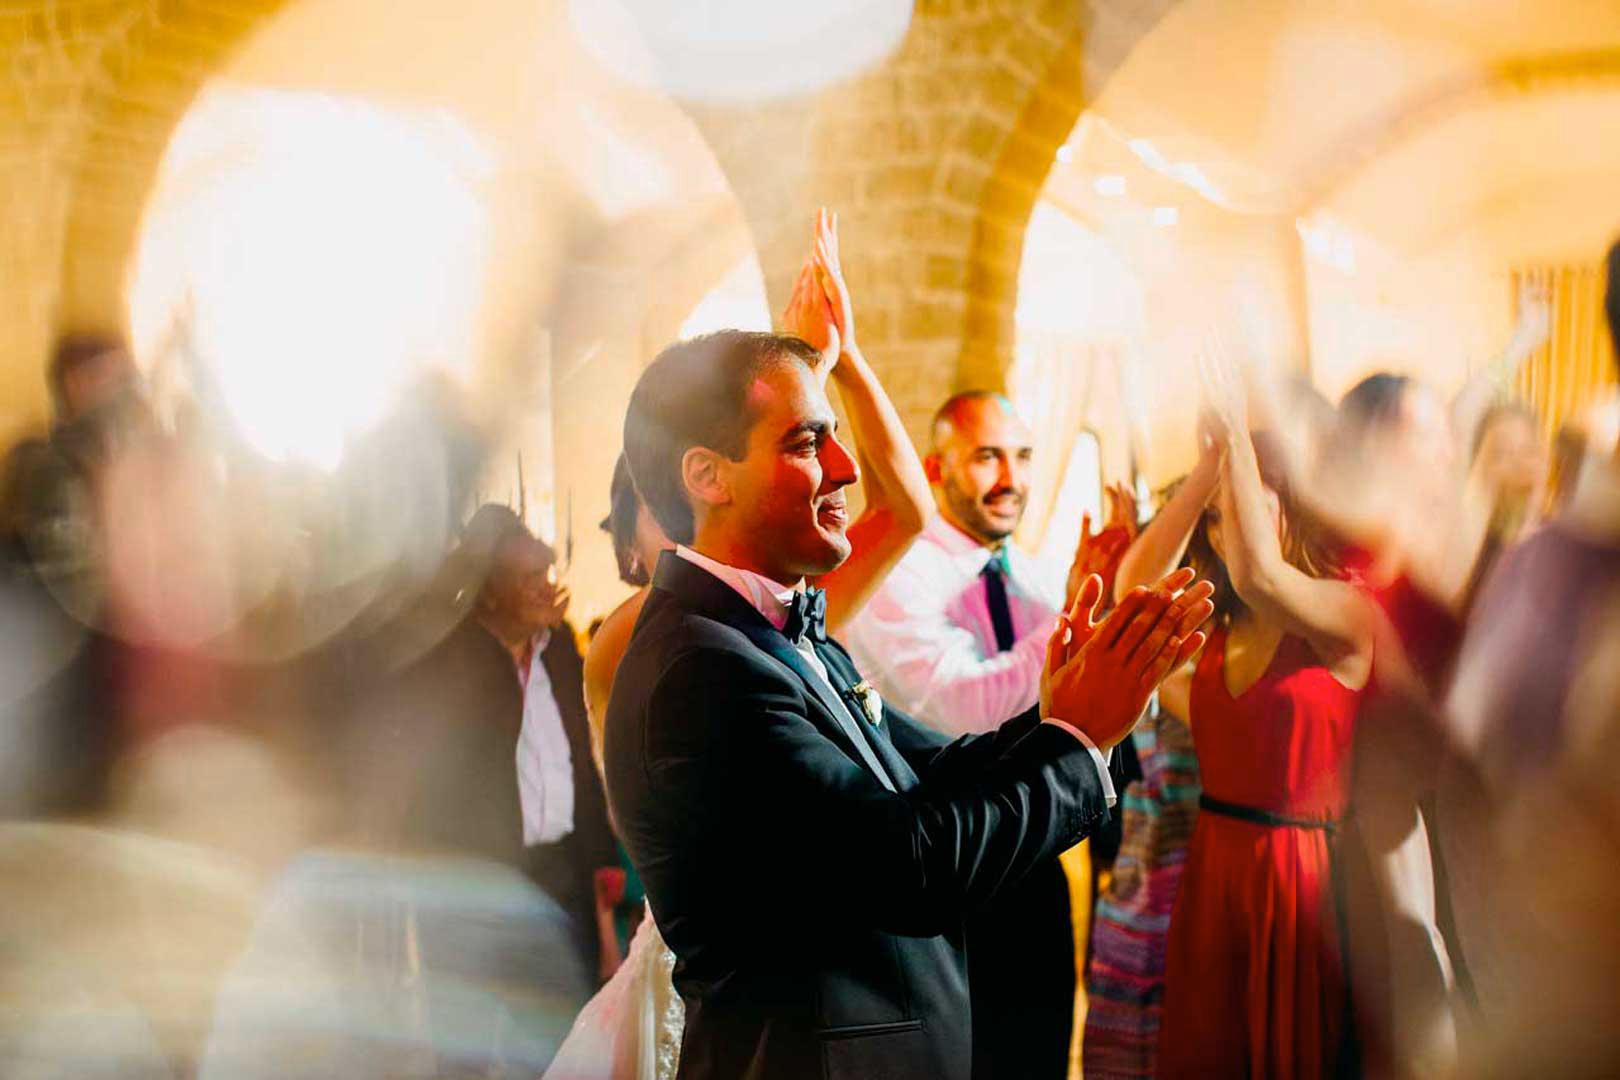 031-sposo-ballerino-matrimonio-gianni-lepore-fotografo